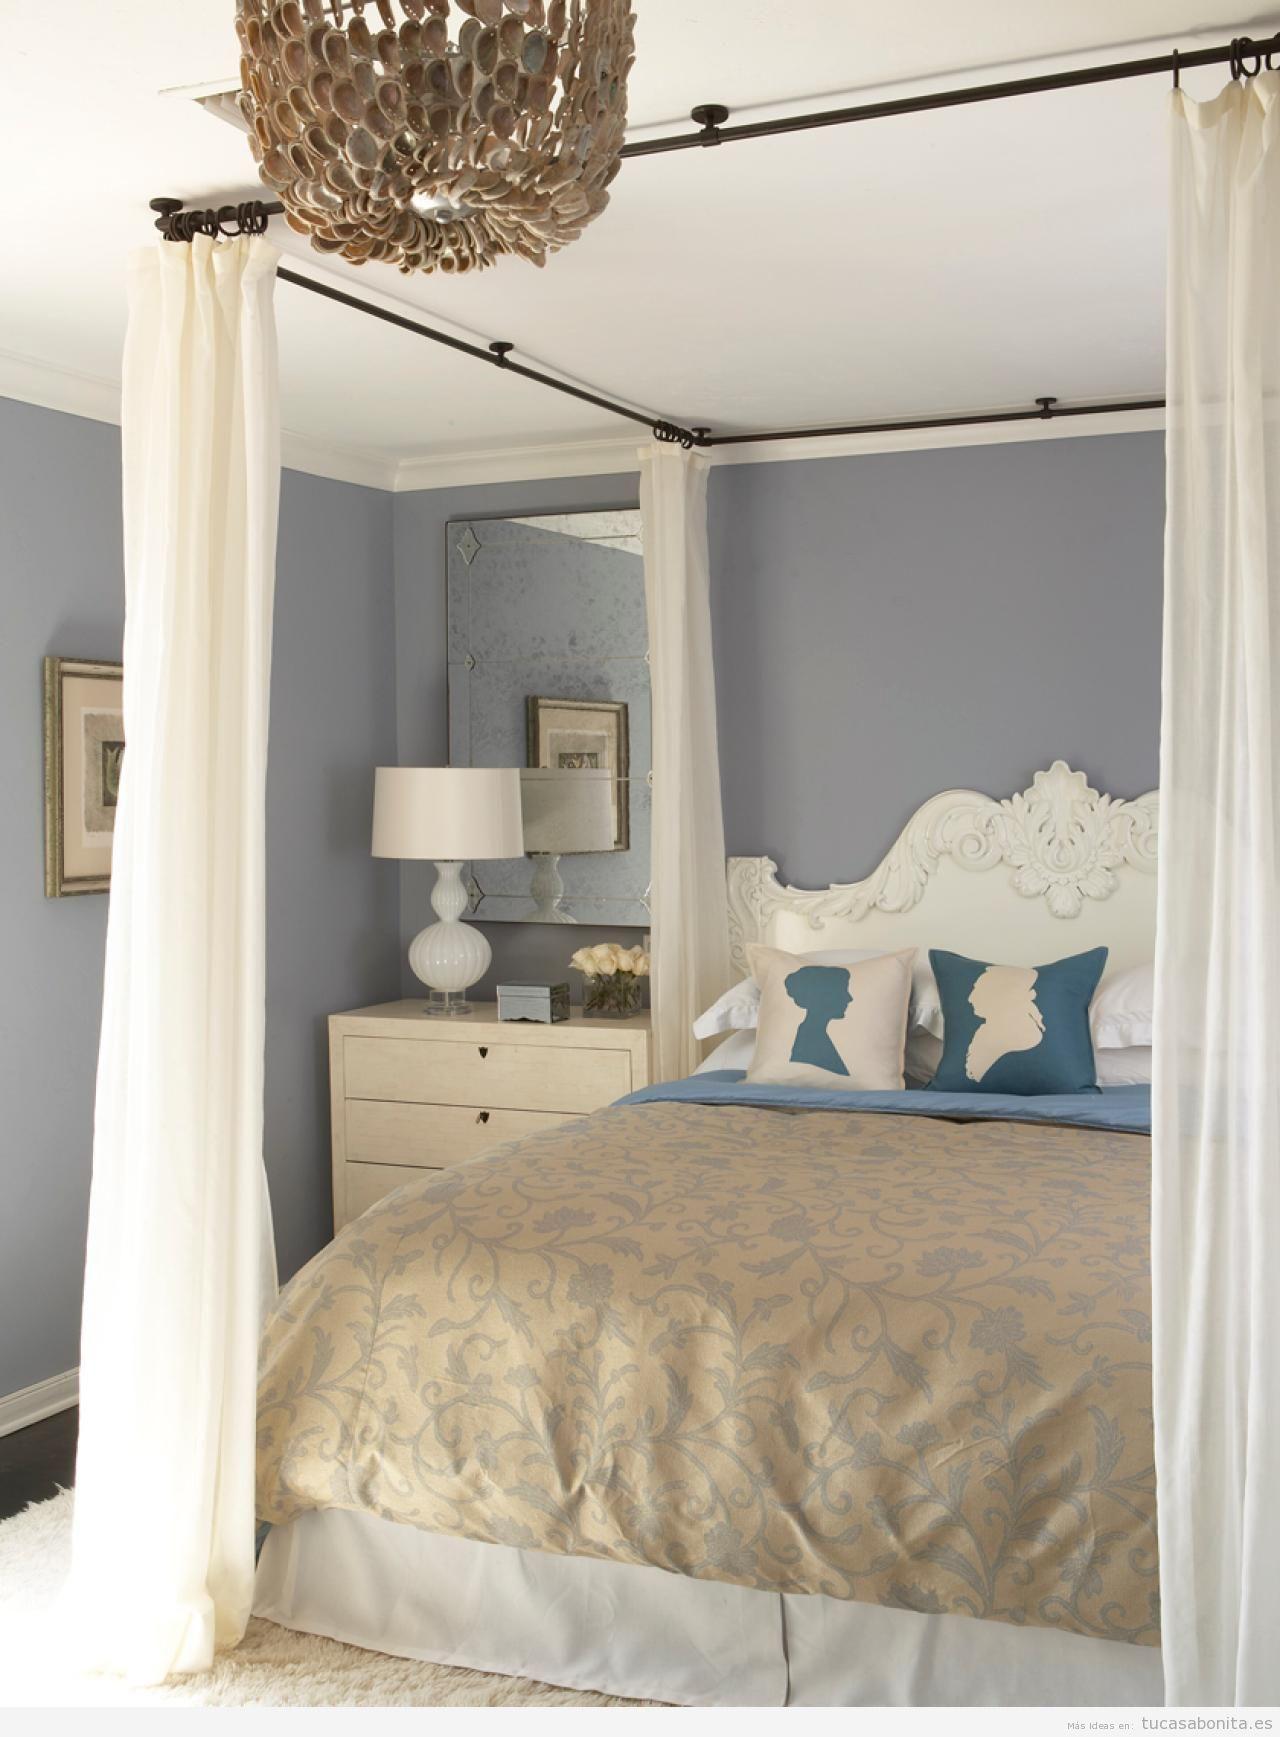 ideas decorar dormitorio matrimonio distintos estilos - Decorar Dormitorio Matrimonio